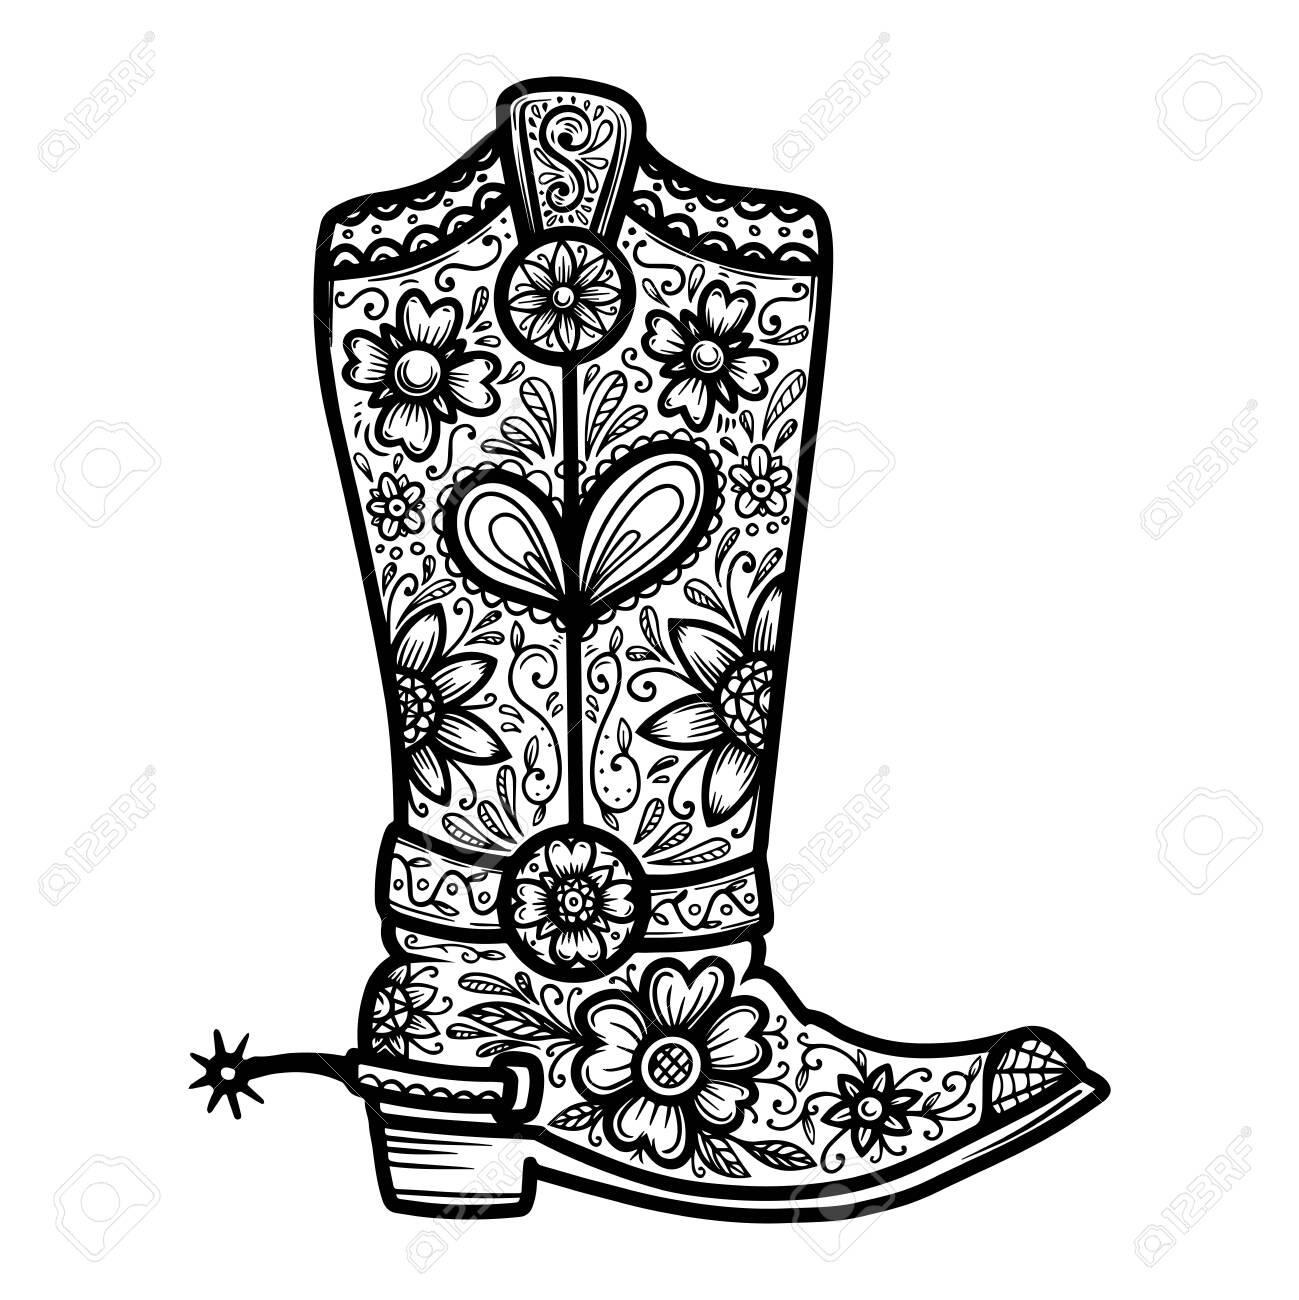 Cowboy boot with floral pattern. Design element for poster, t shirt, emblem, sign. - 125980961